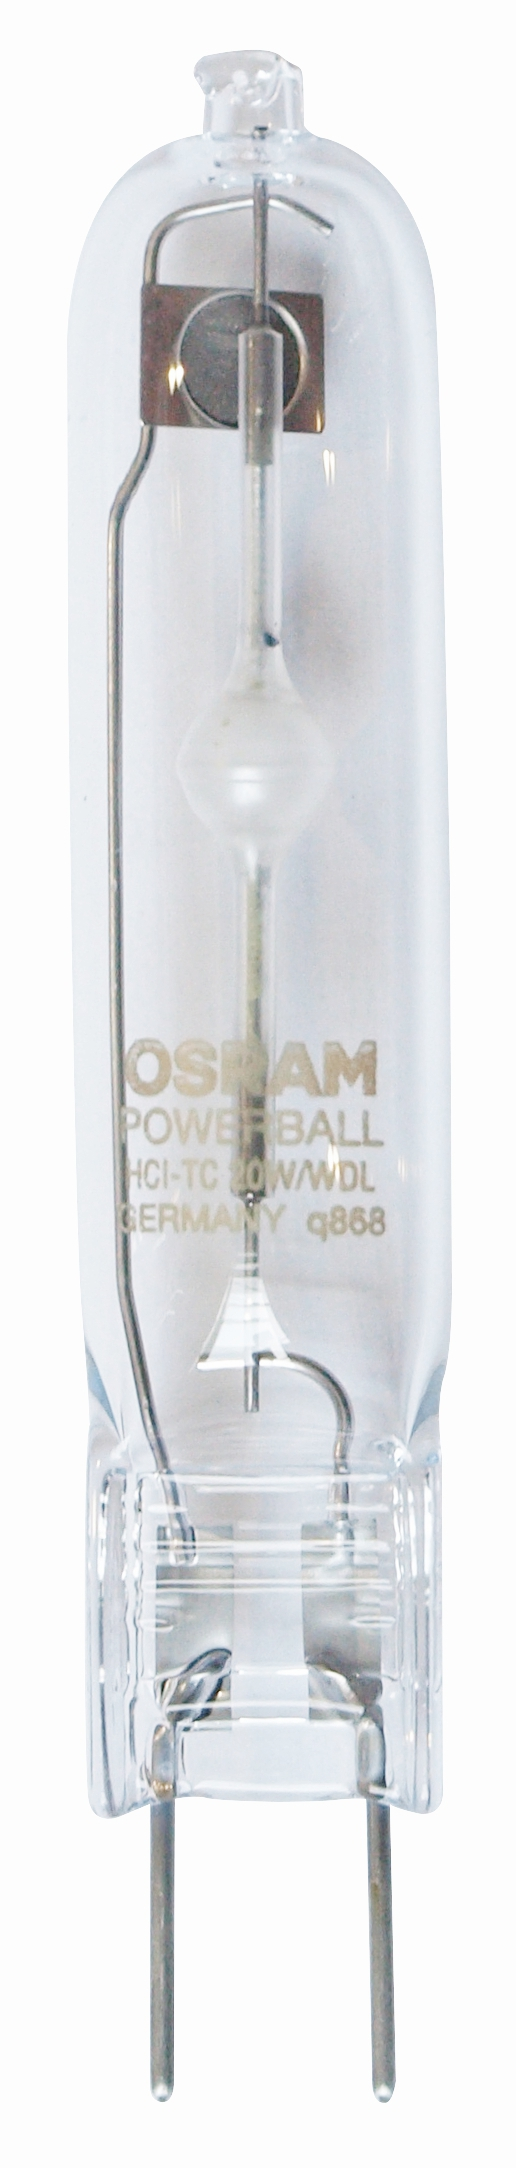 1 Stk HIT-CE TC 20W/830 G8,5 Metalldampfentladungslampe LI5Z052216